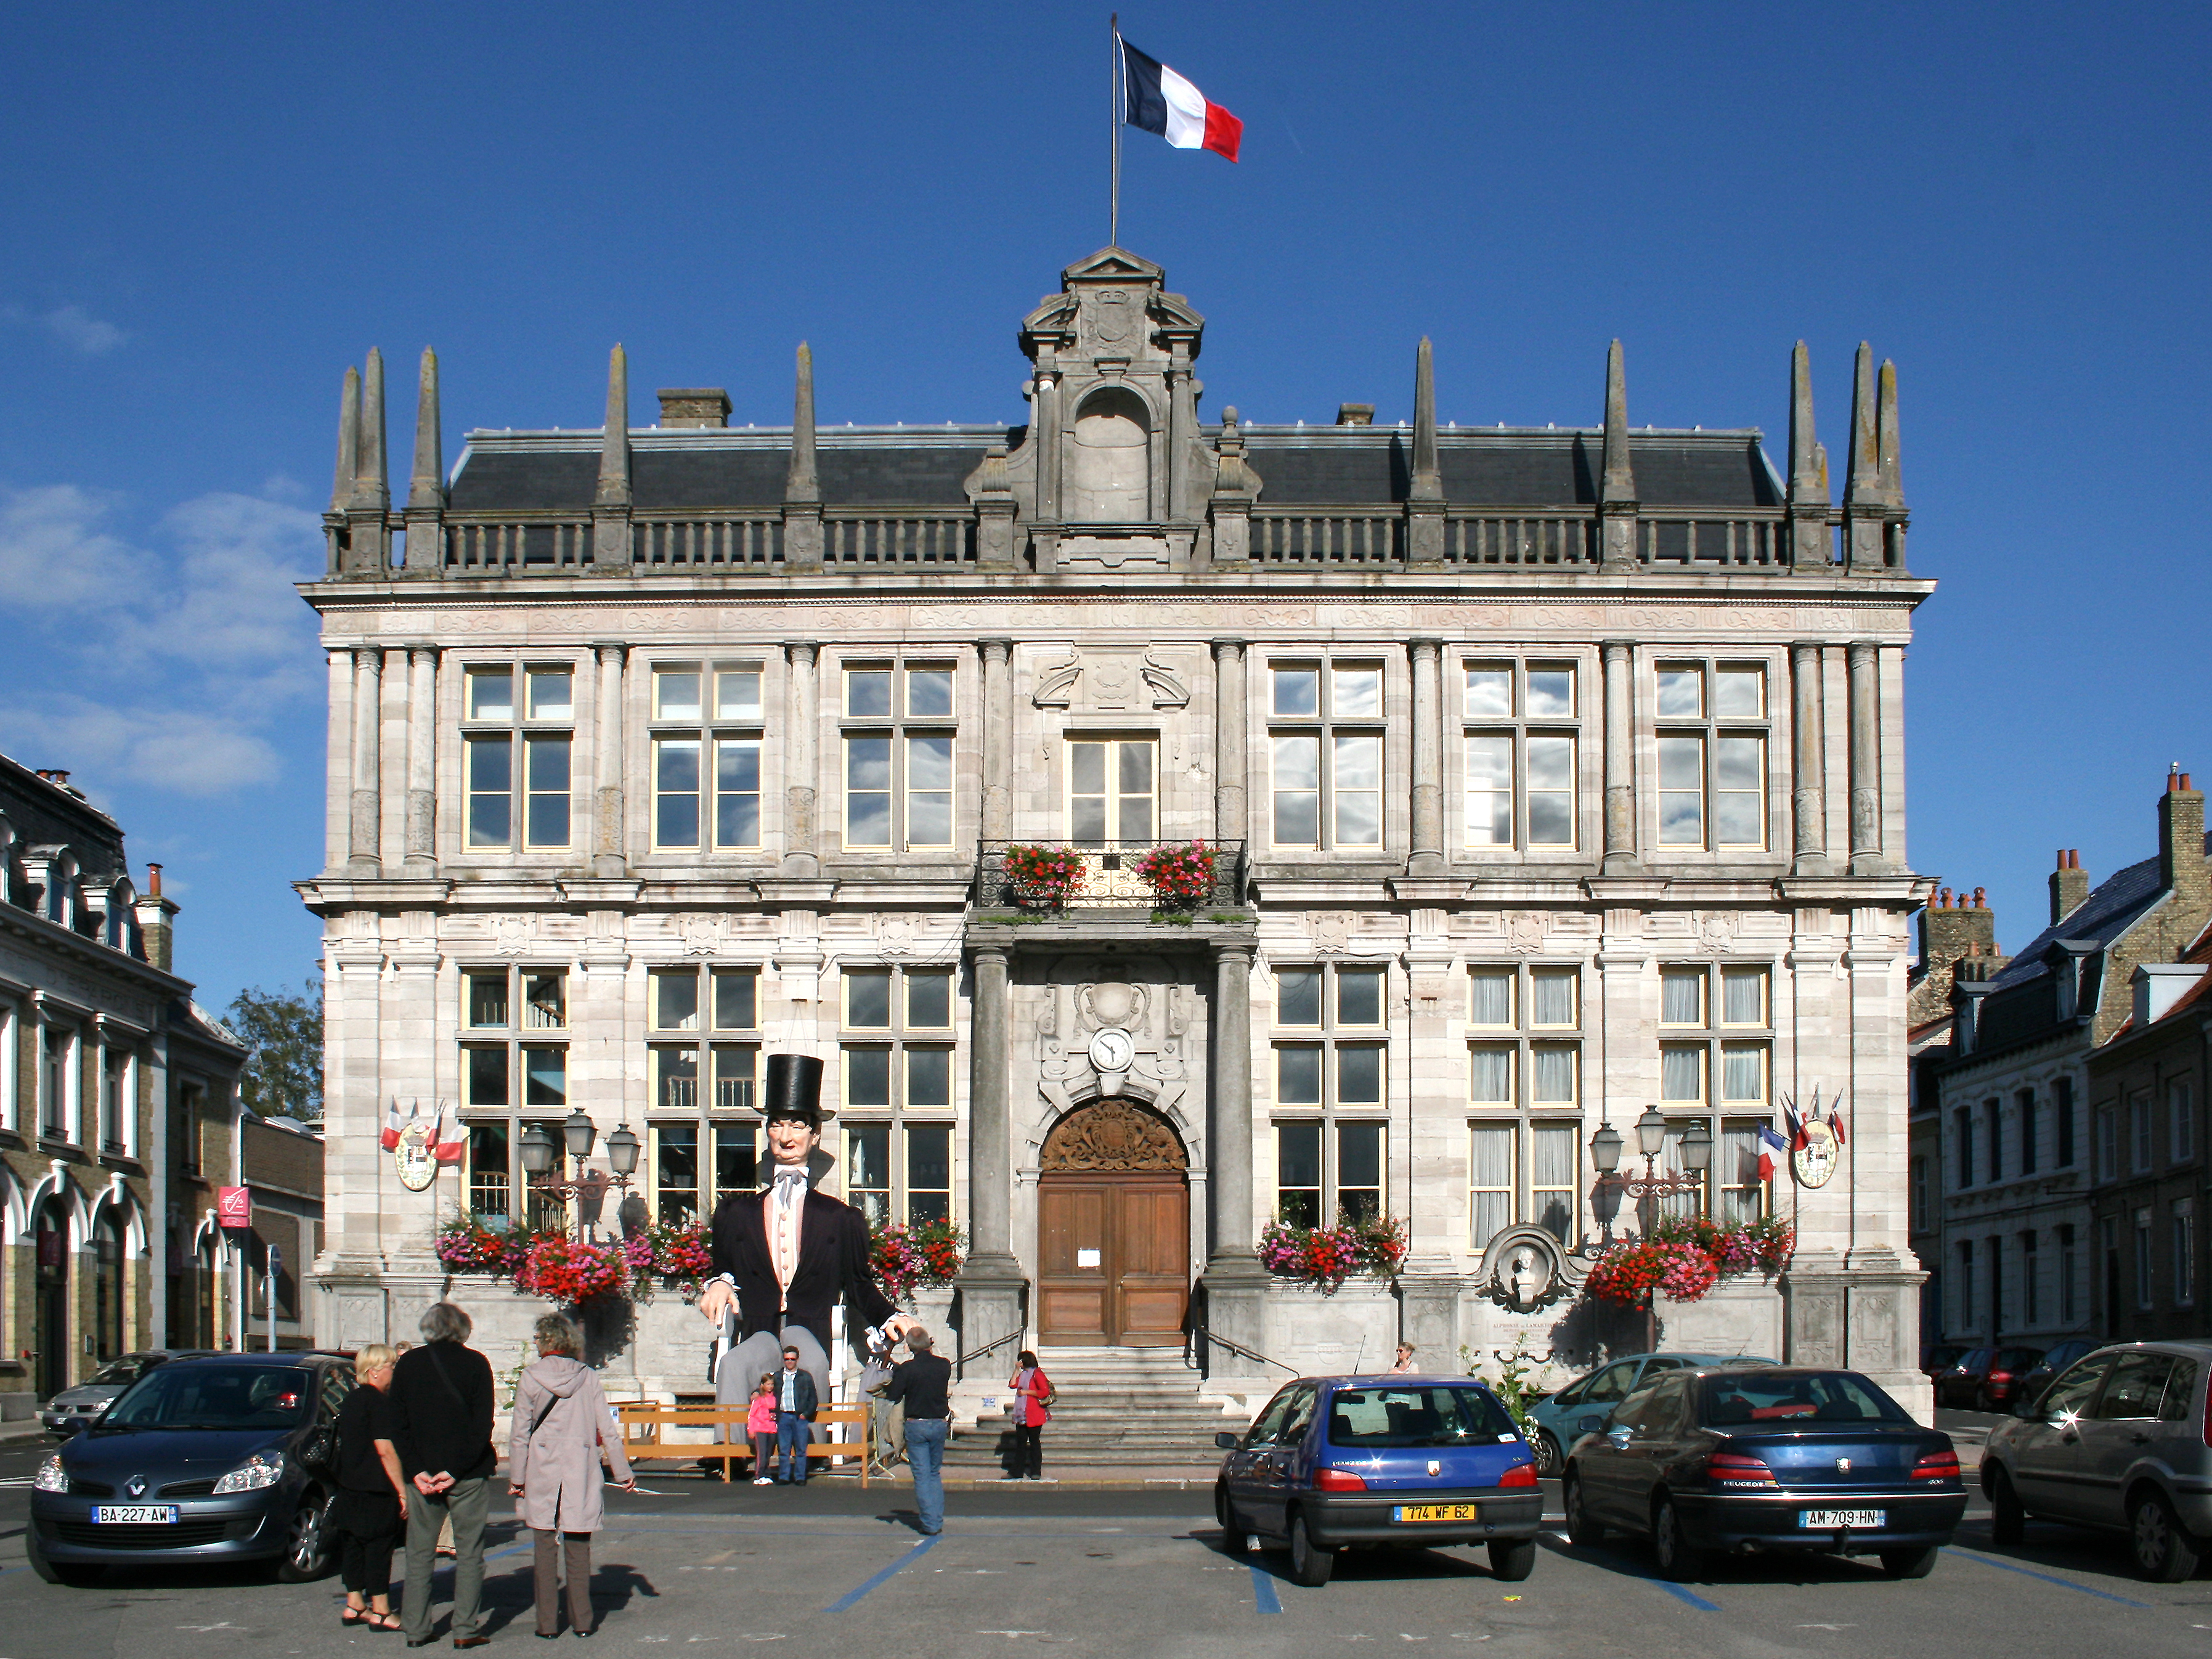 Hotel De France Narbonne Rue Robini